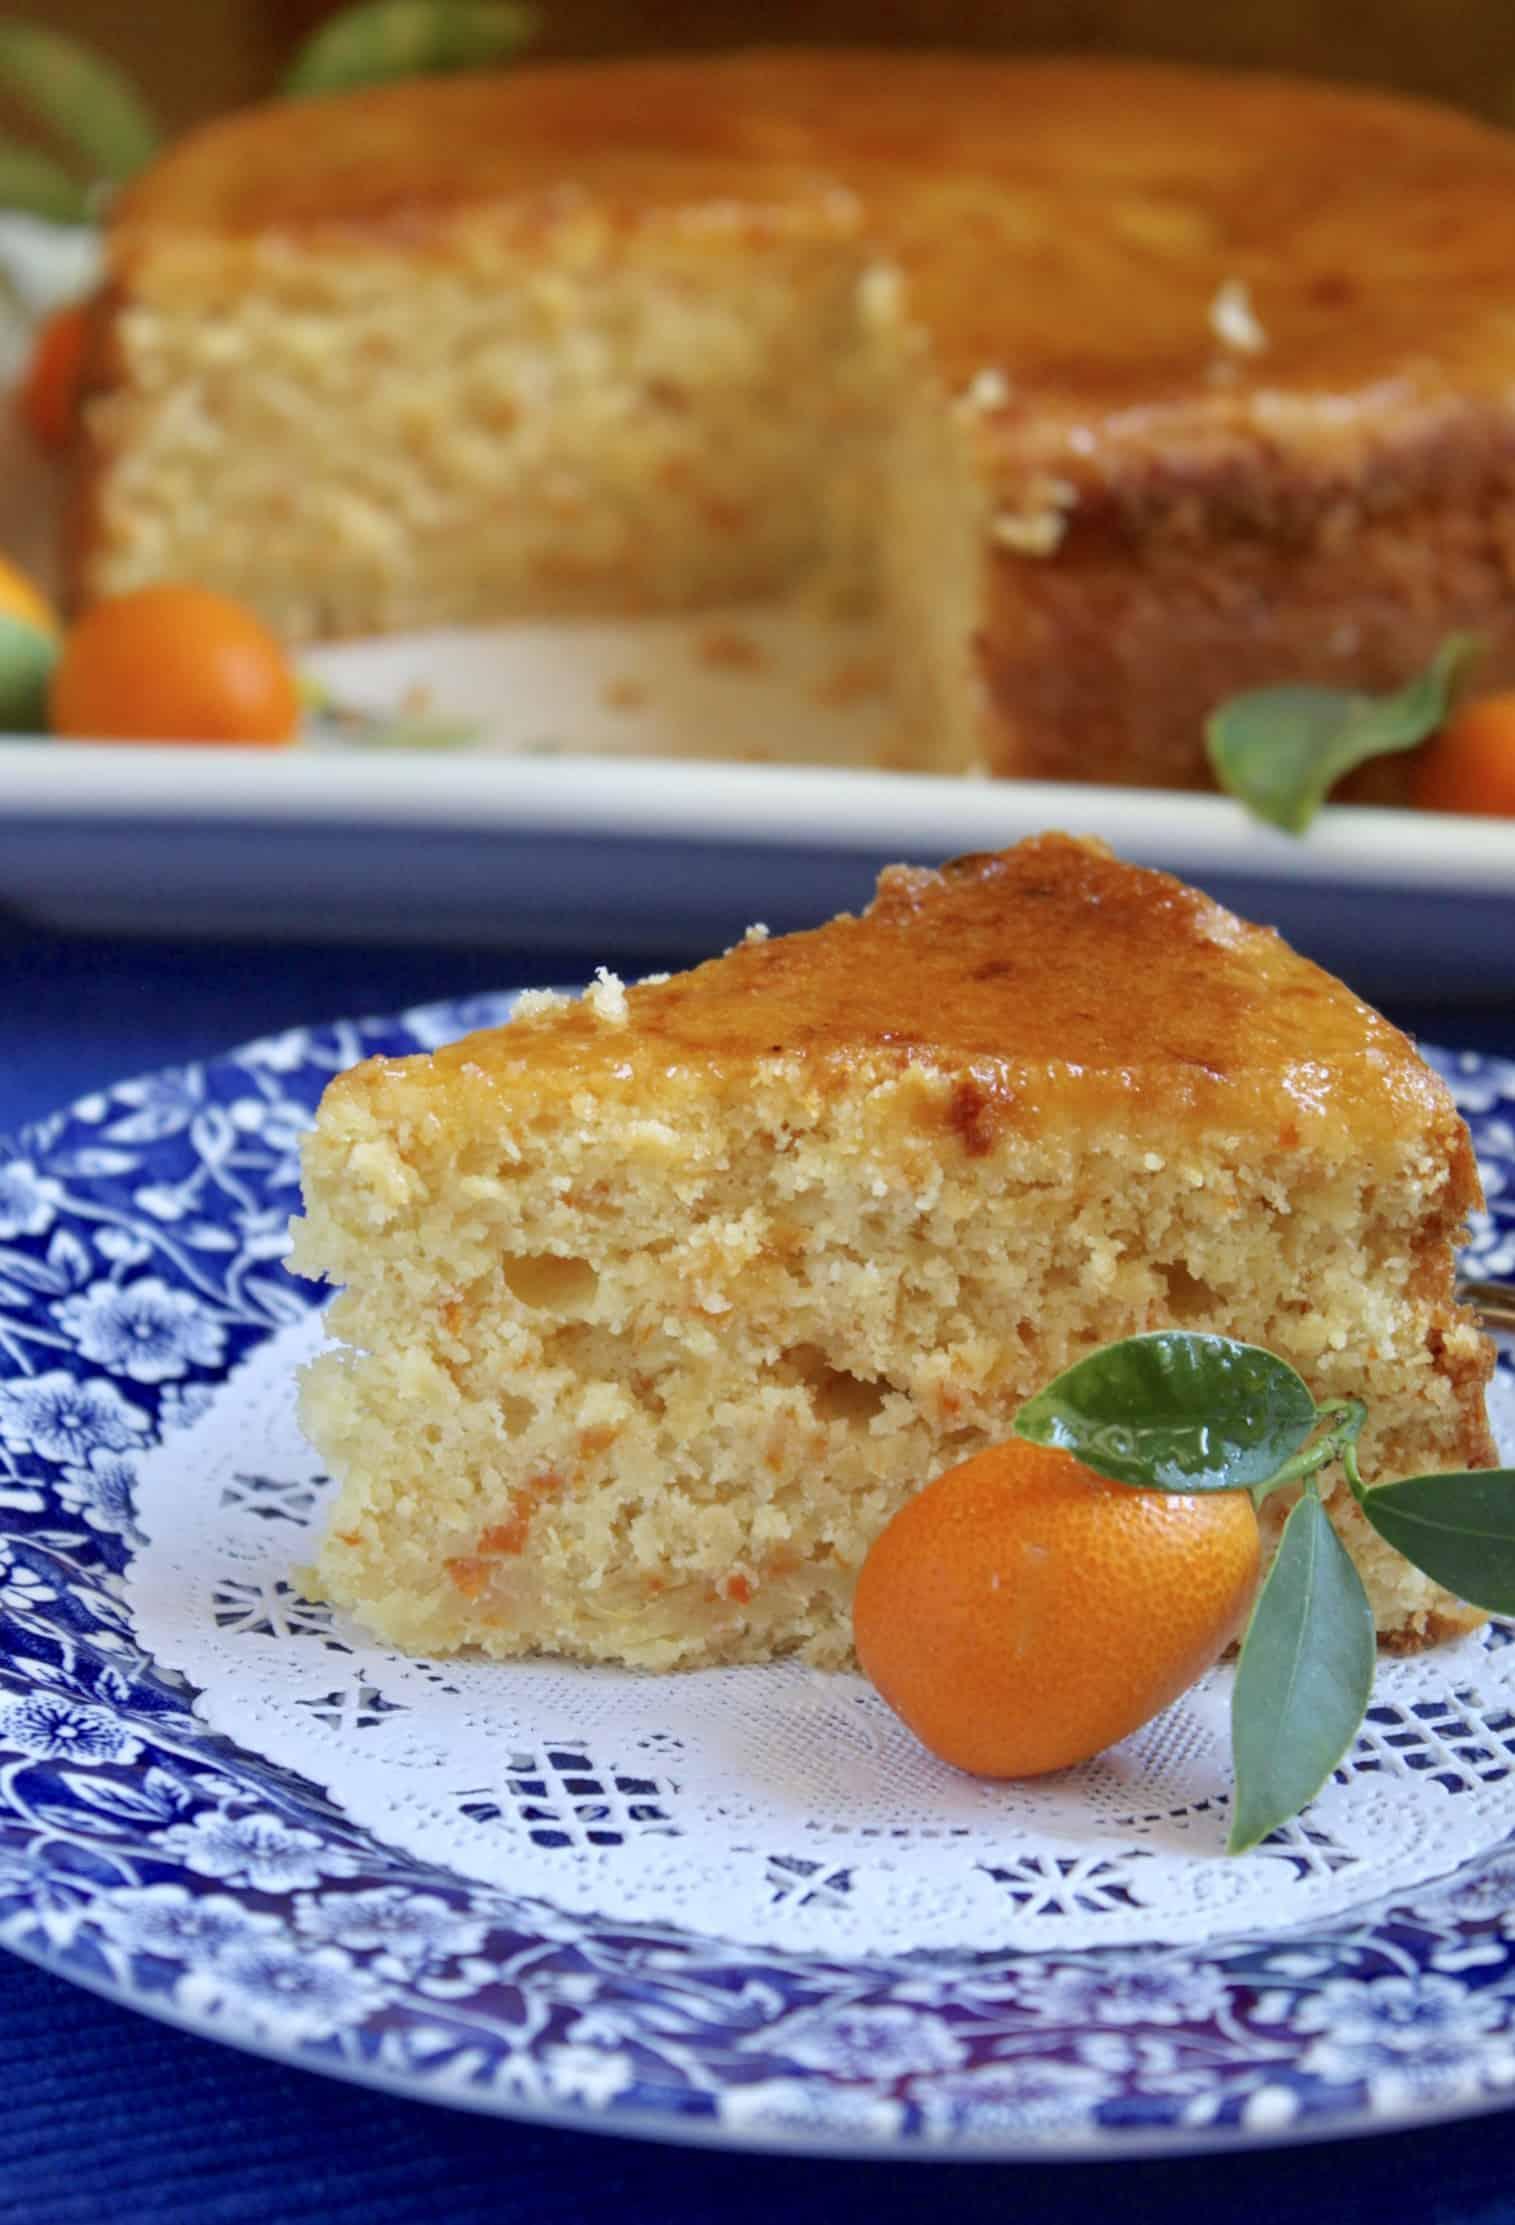 kumquat cake slice on plate